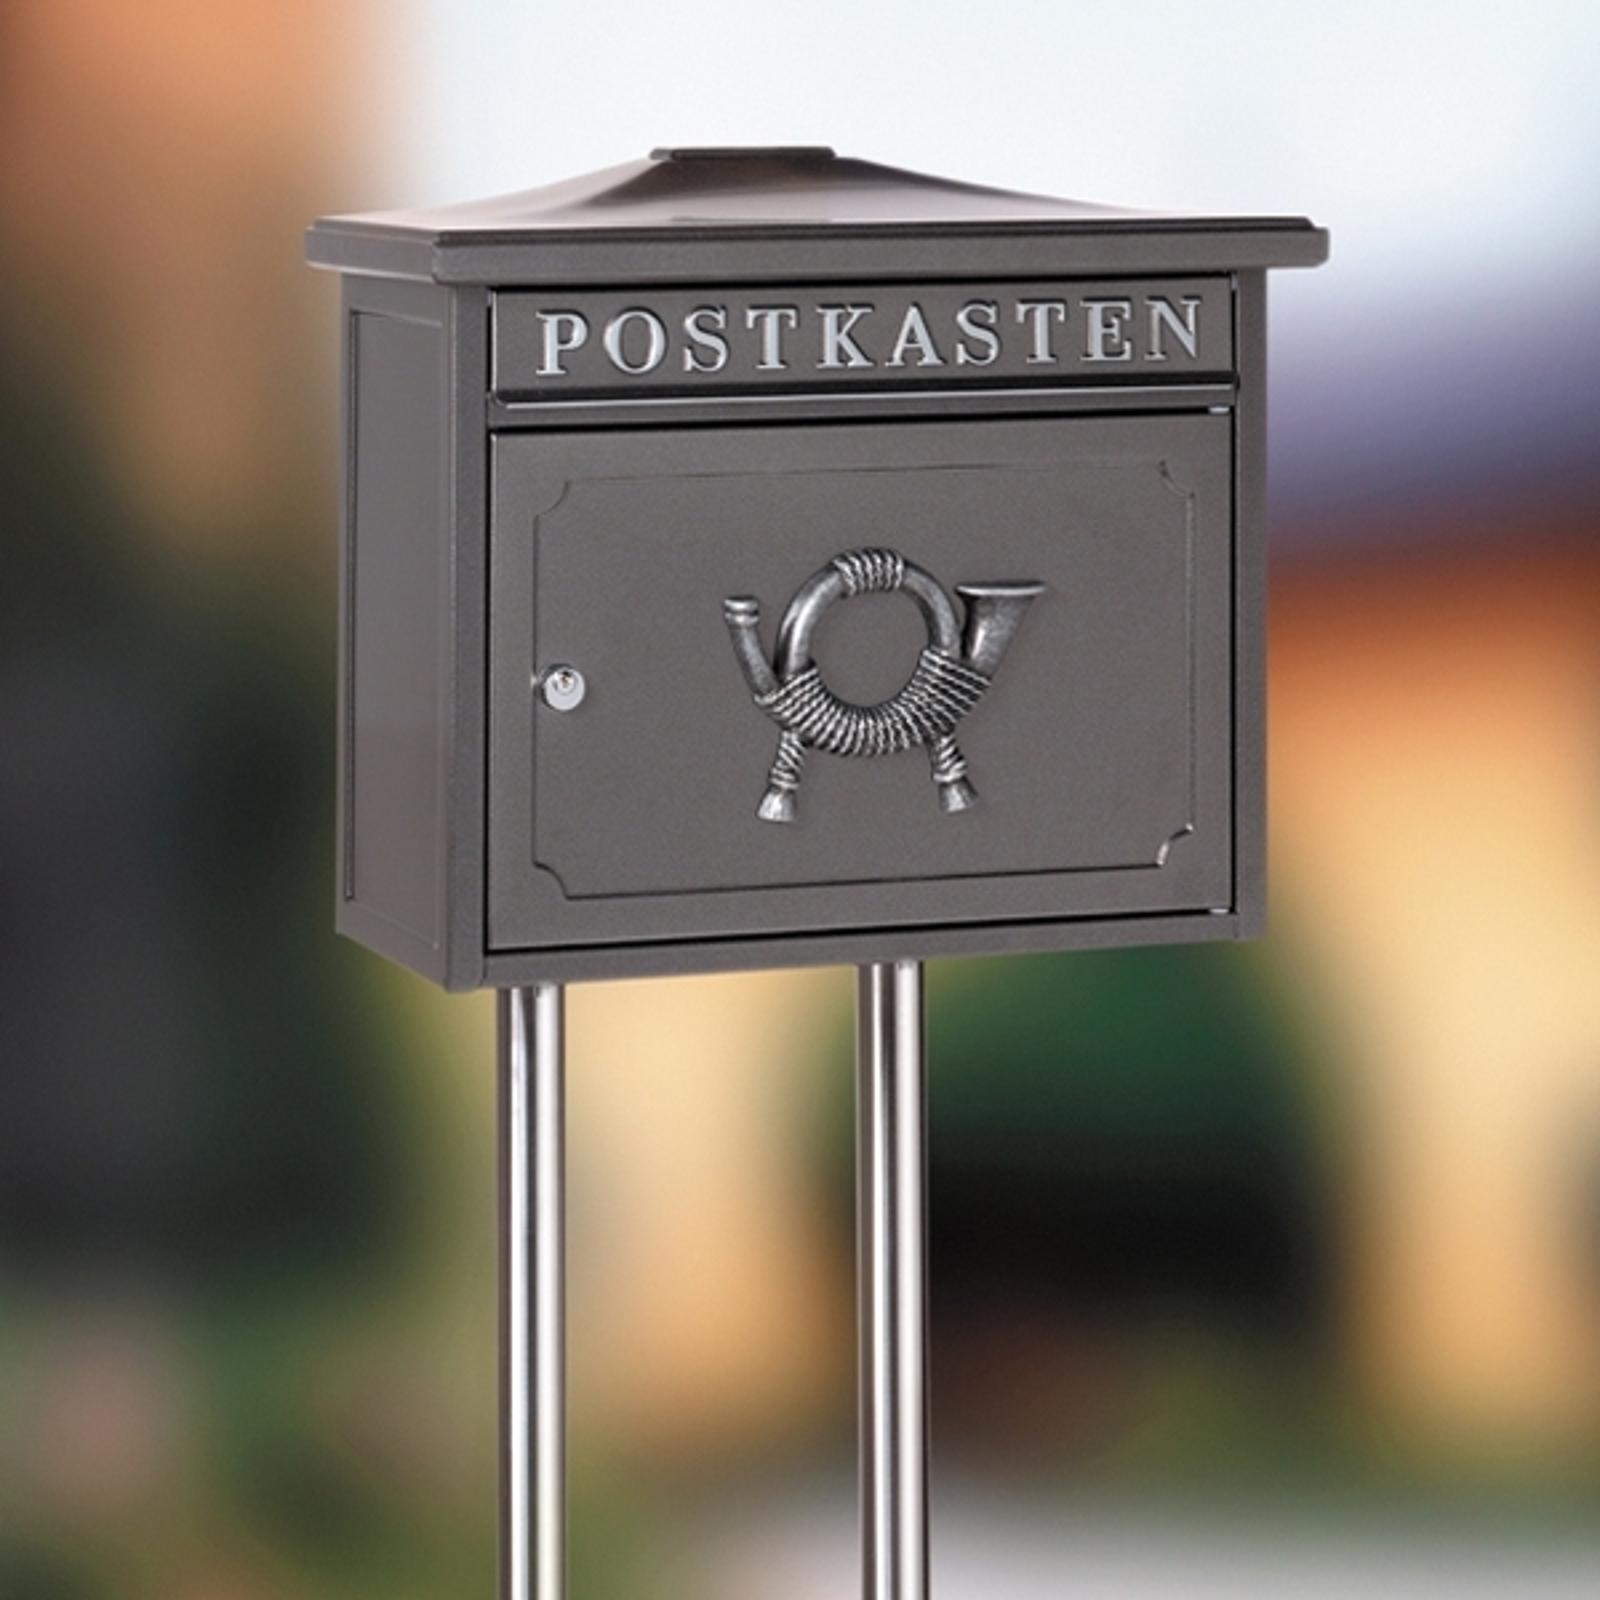 UNIVERSAL 150 Ni postkassestander